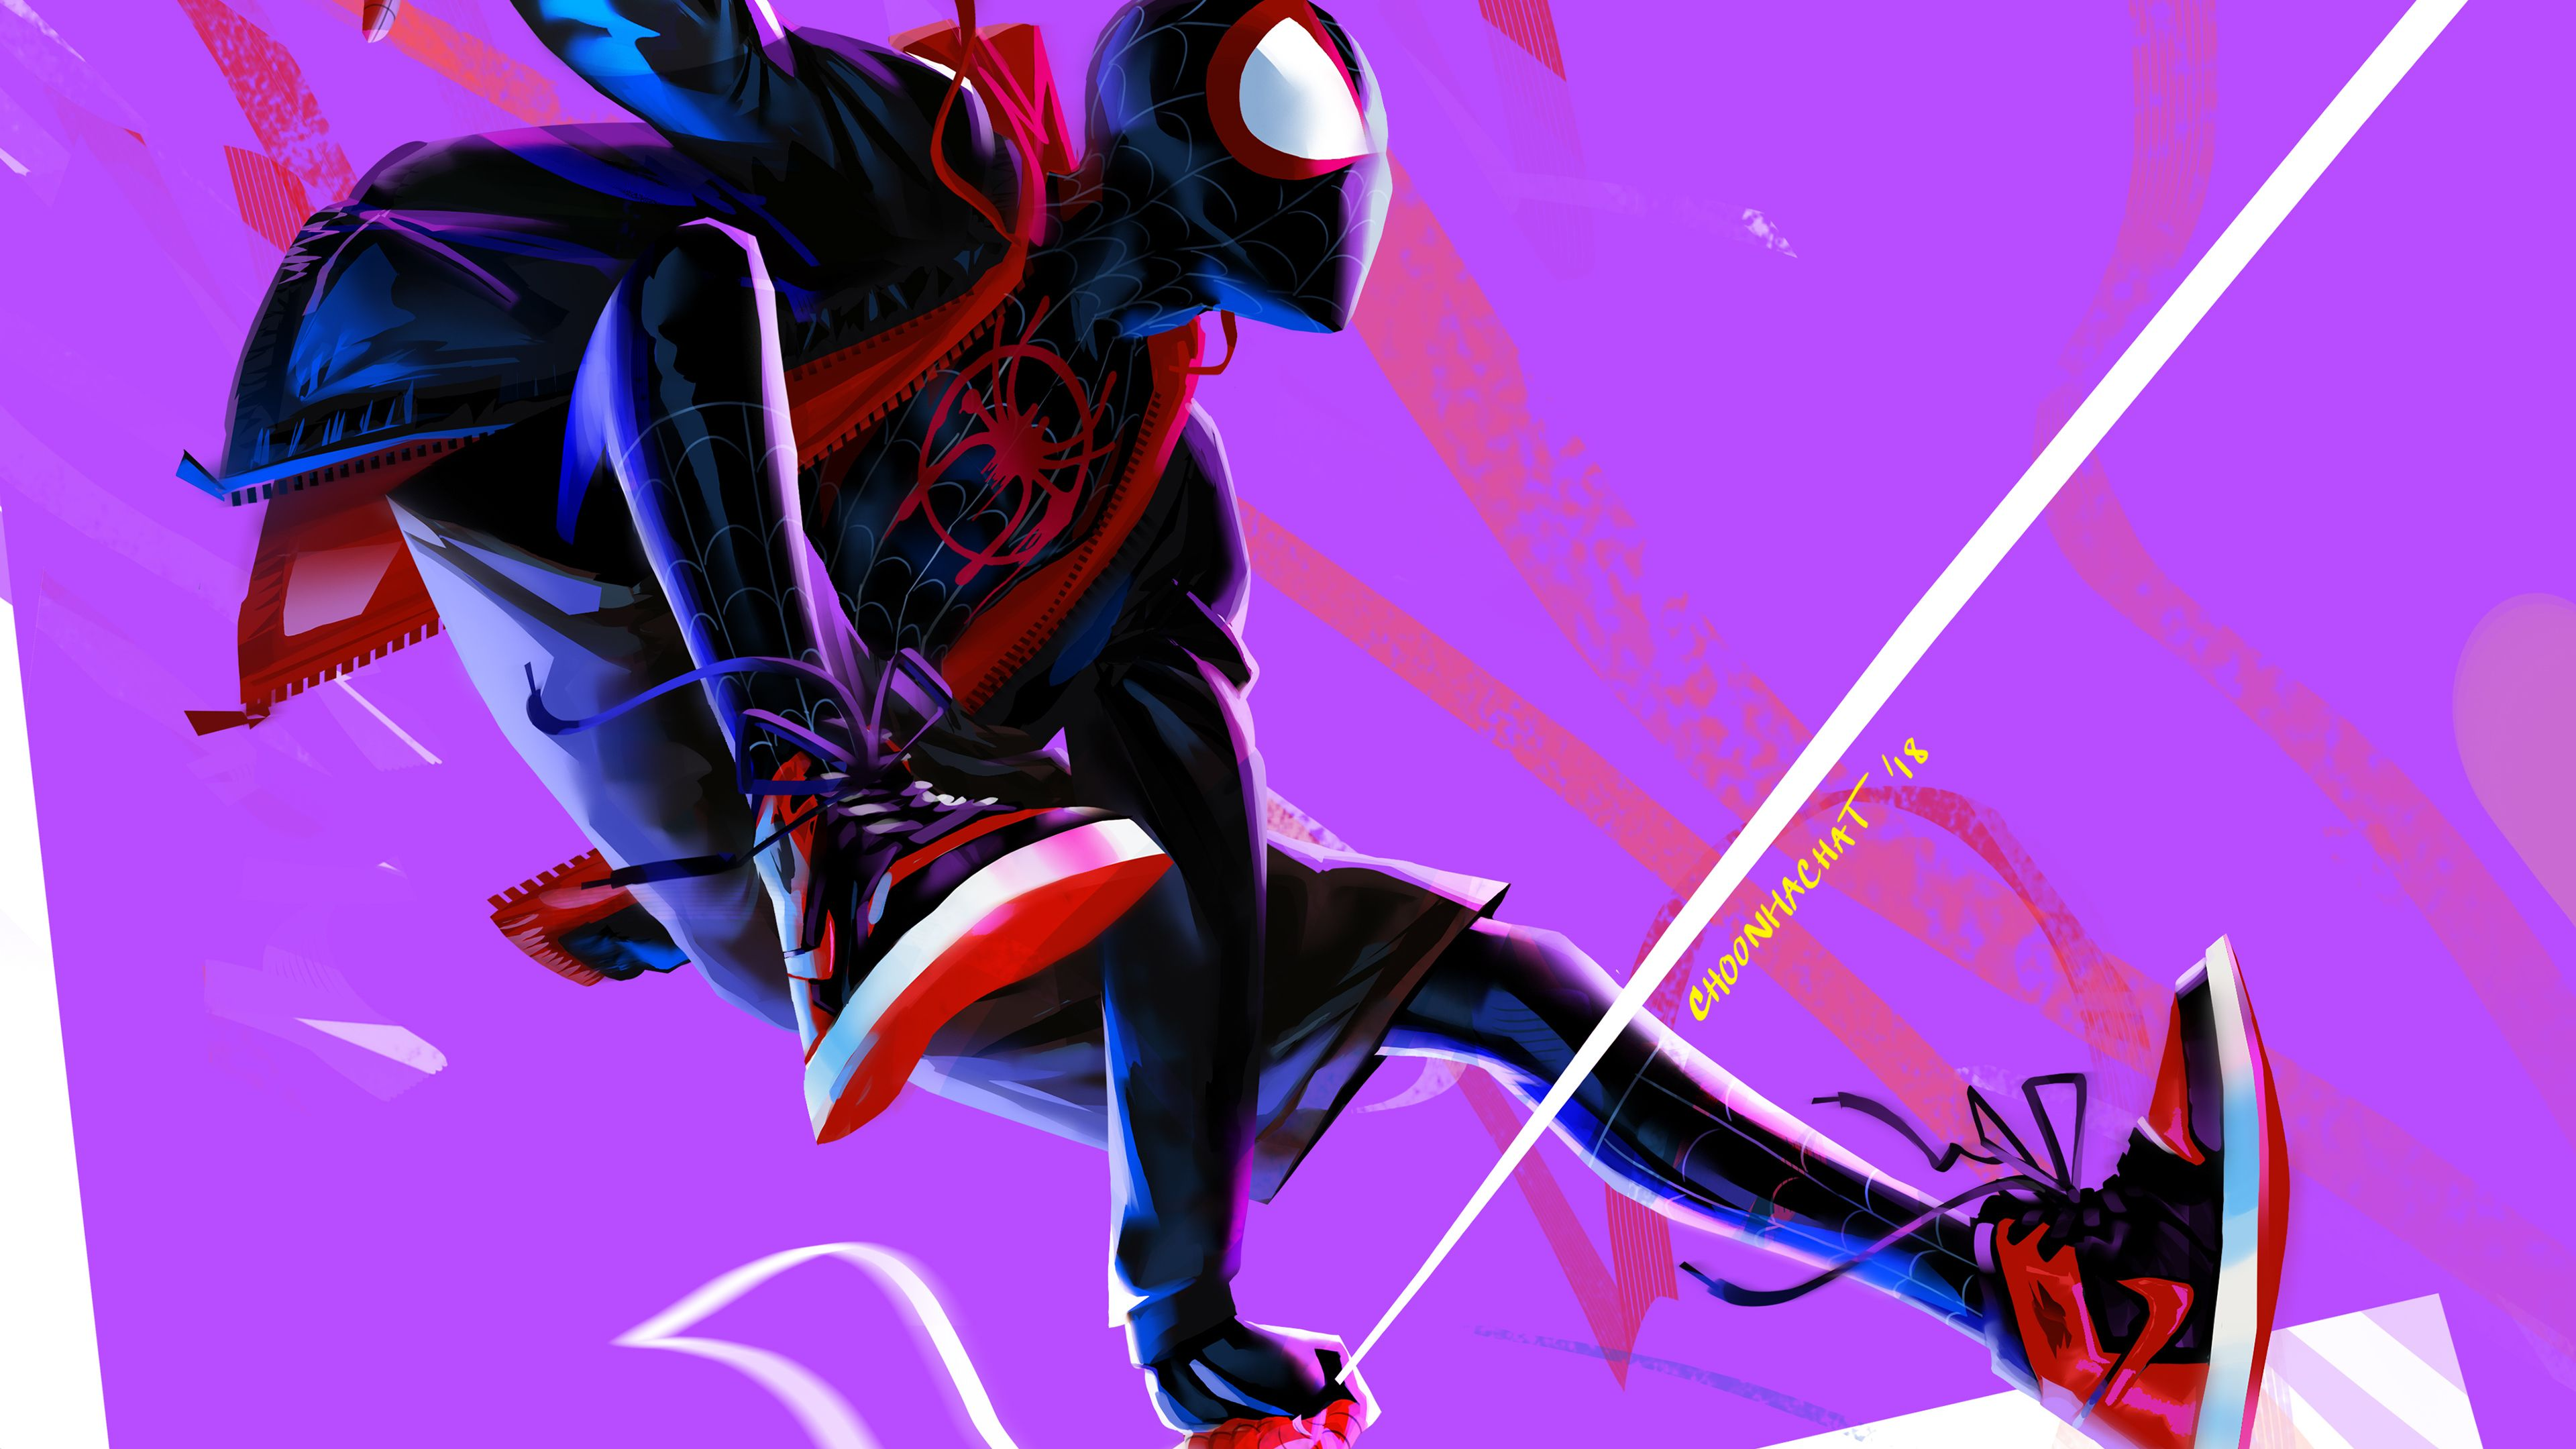 Miles Morales In Spider Man Into The Spider Verse 4k Artwork superheroes wallpapers, spiderman ...